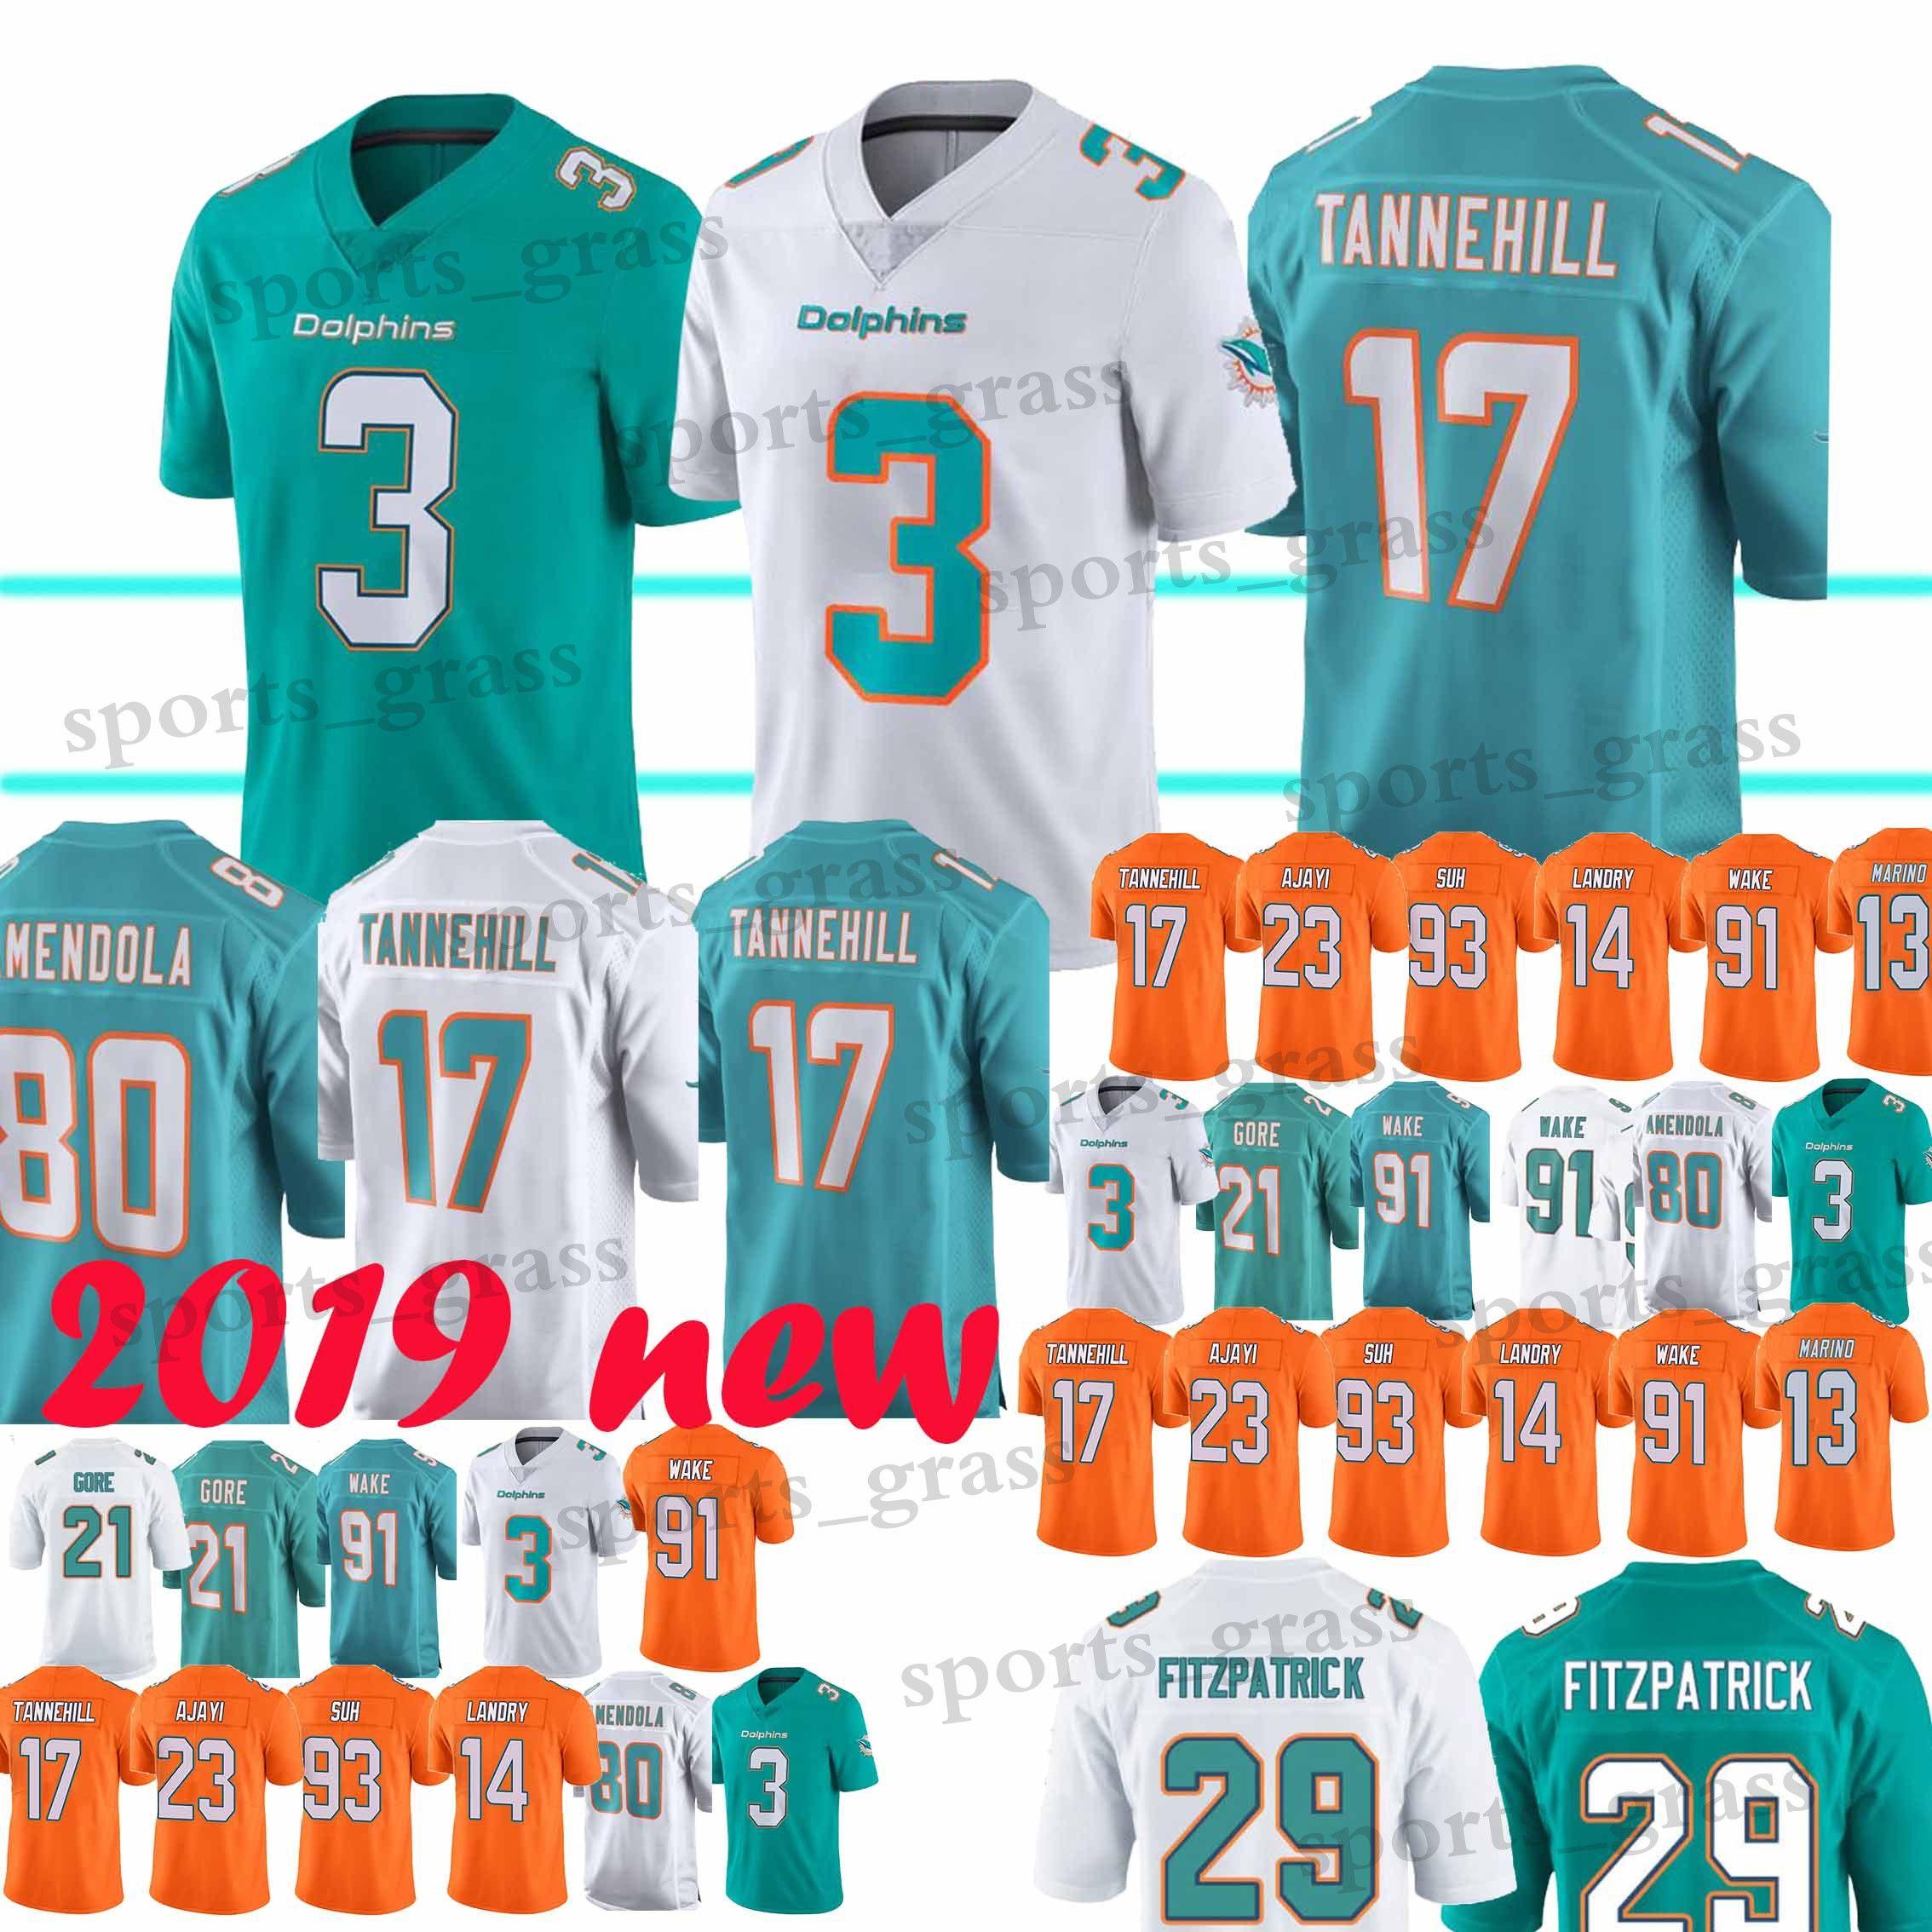 competitive price 02517 ce612 3 Josh Rosen Miami Jerseys Dolphins 29 Minkah Fitzpatrick 21 Frank Gore 80  Danny Amendola 91 Cameron Wake 13 Dan Marino Jerseys